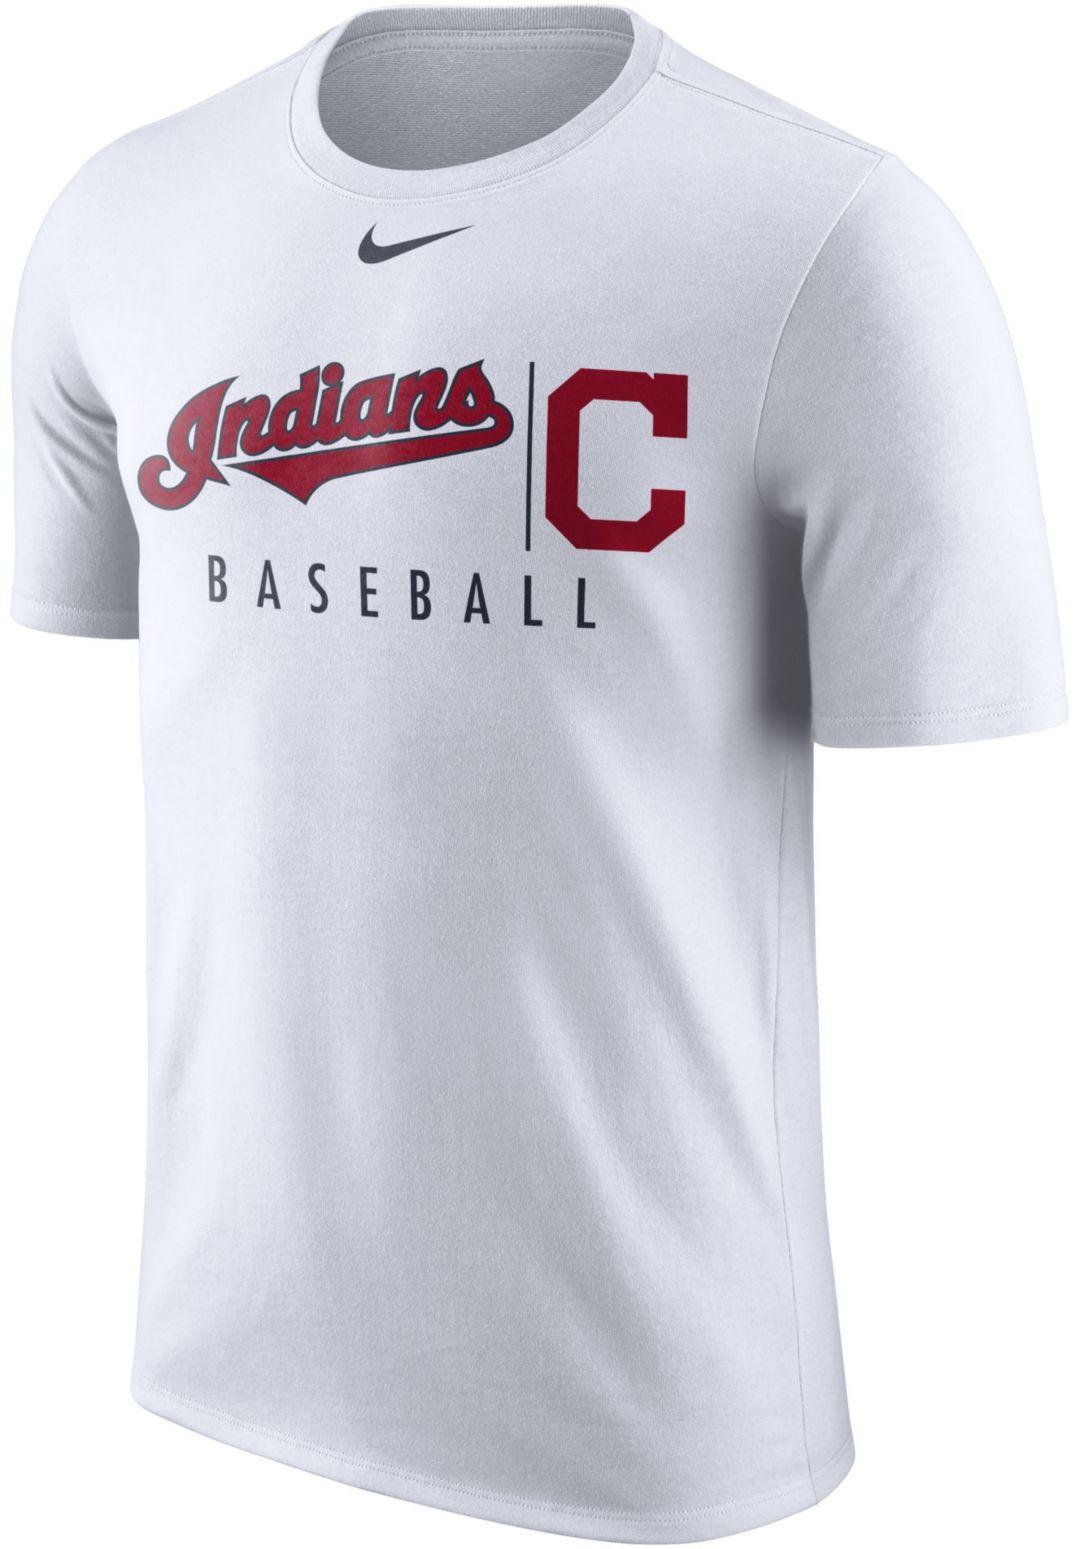 buy online f11f3 54490 Nike Men's Cleveland Indians Practice T-Shirt